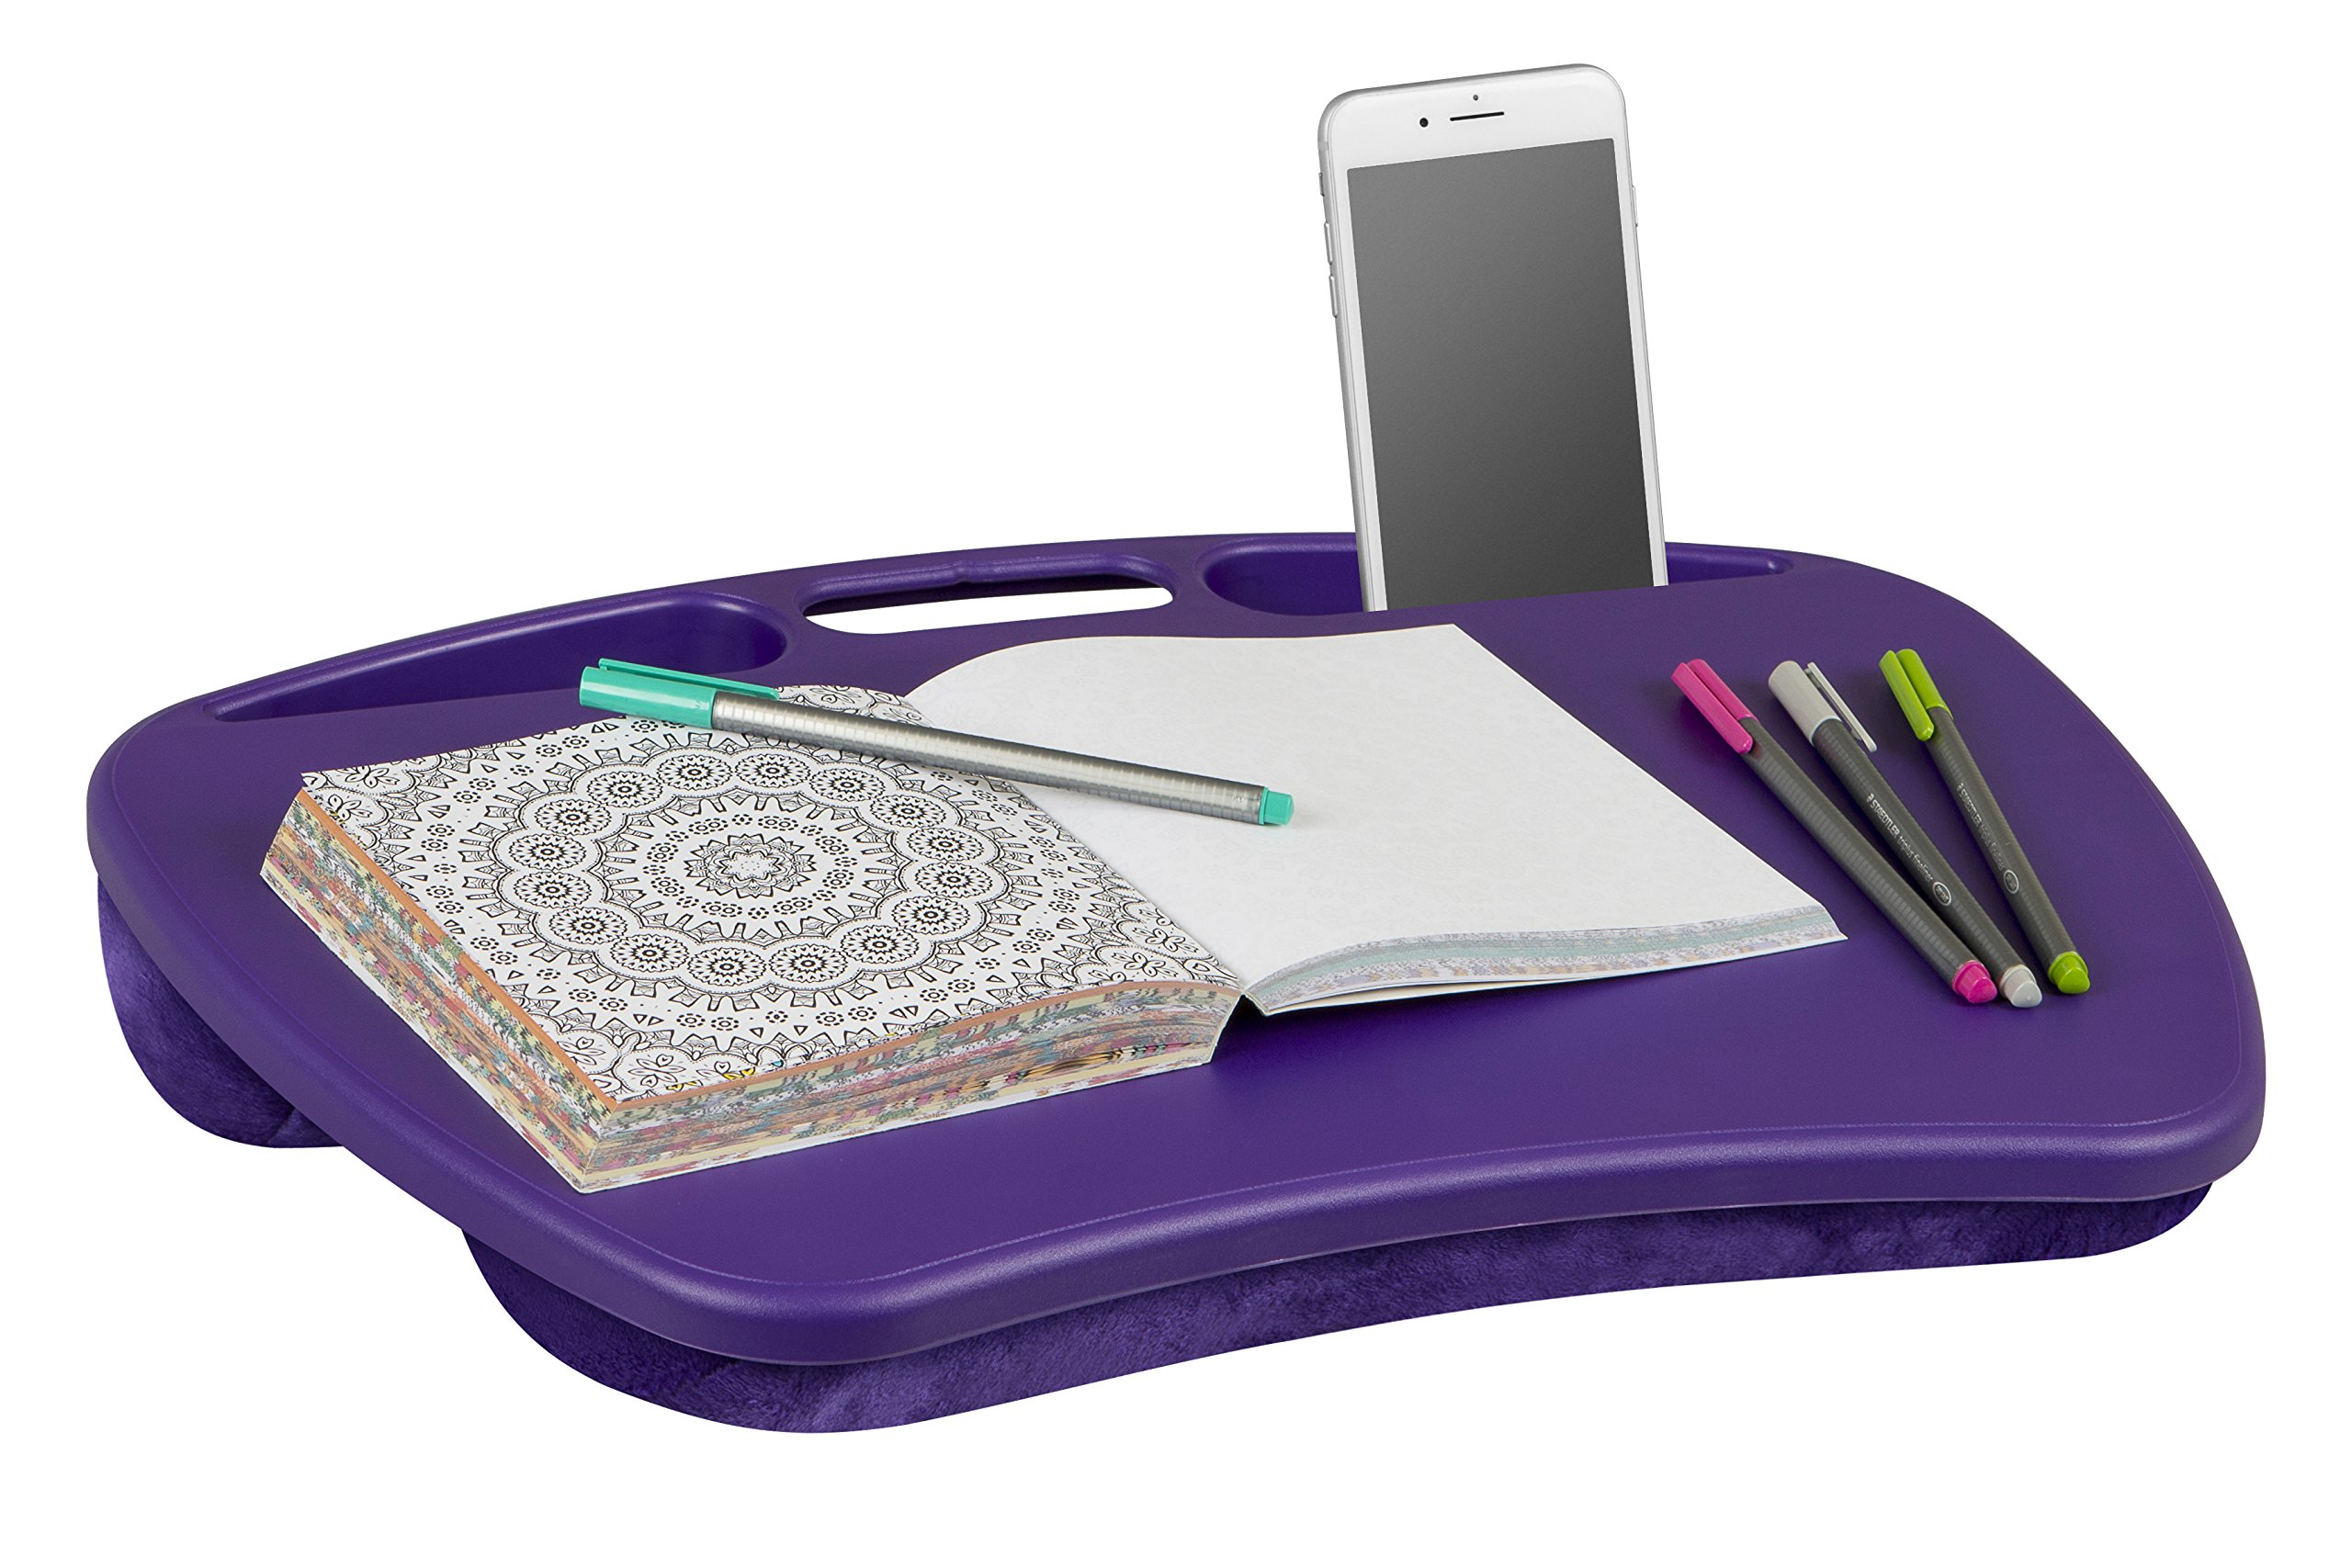 LapGear MyDesk Lap Desk - Purple (Fits up to 15.6'' Laptop) - Style #45342